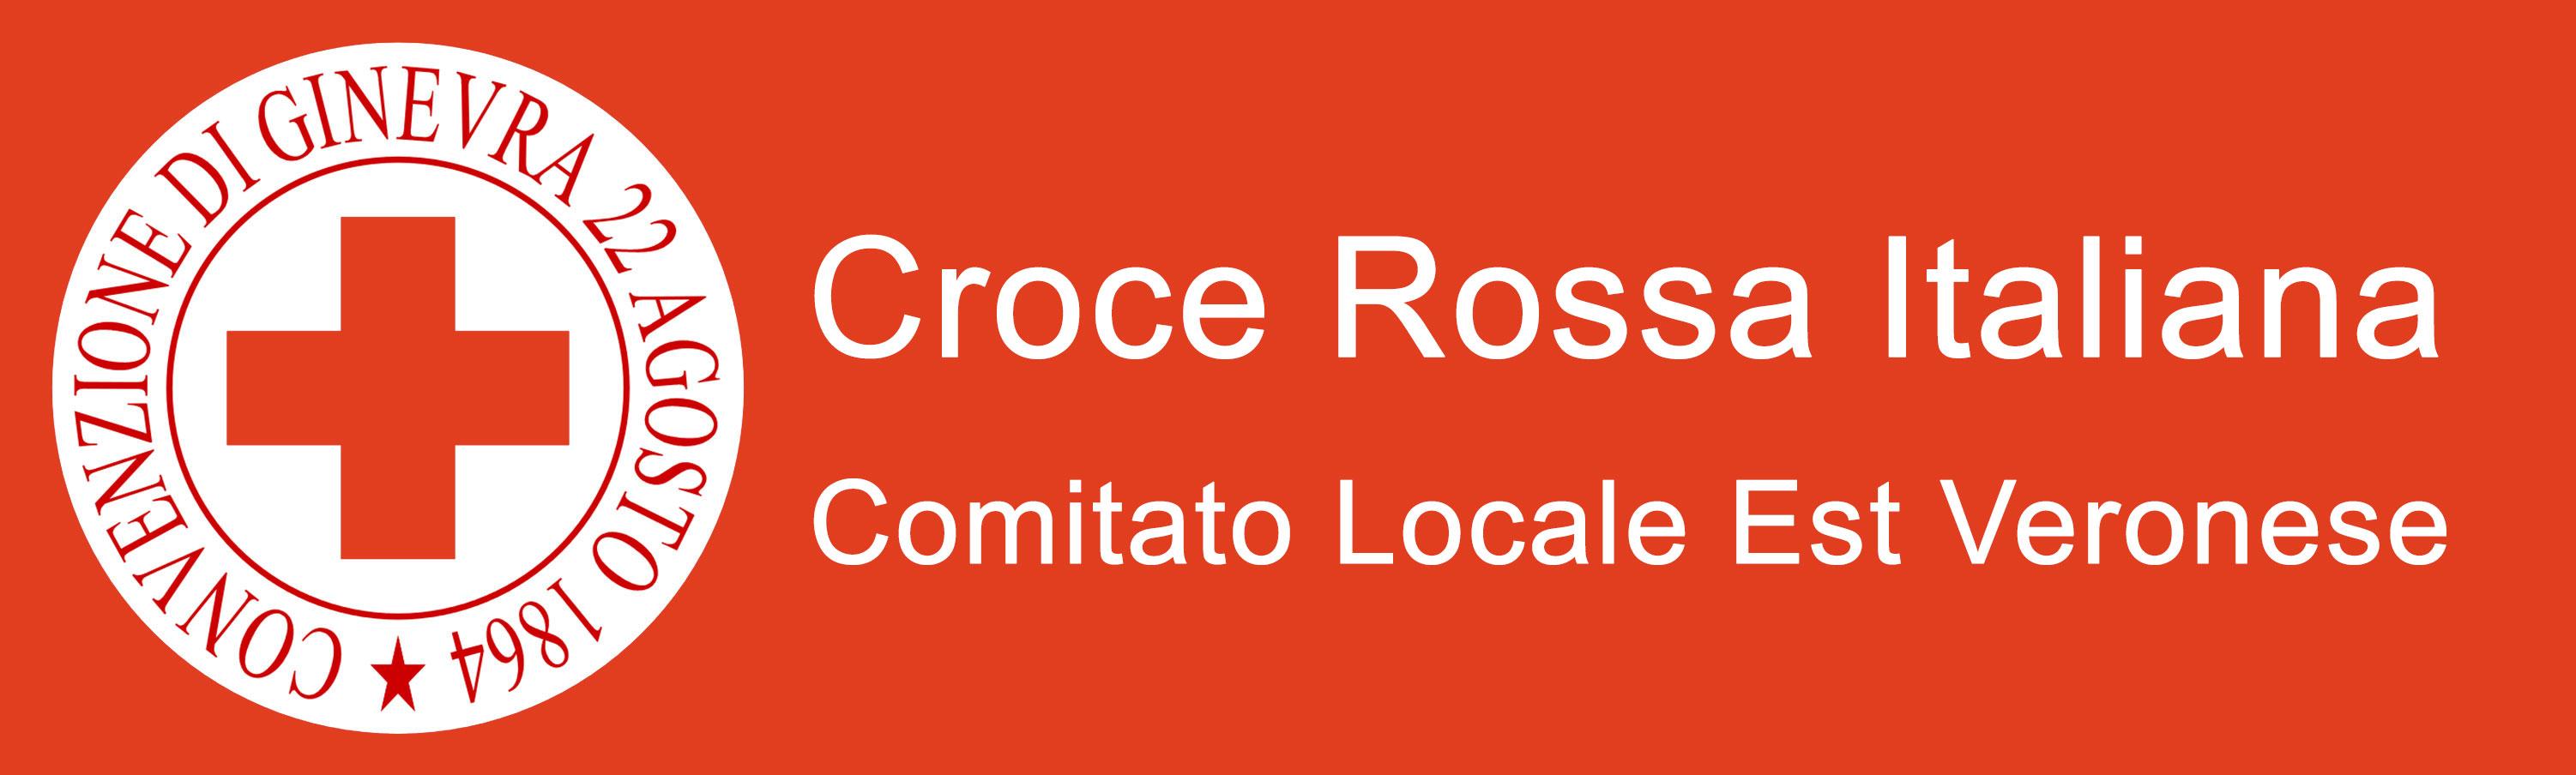 Croce Rossa Italiana Est Veronese